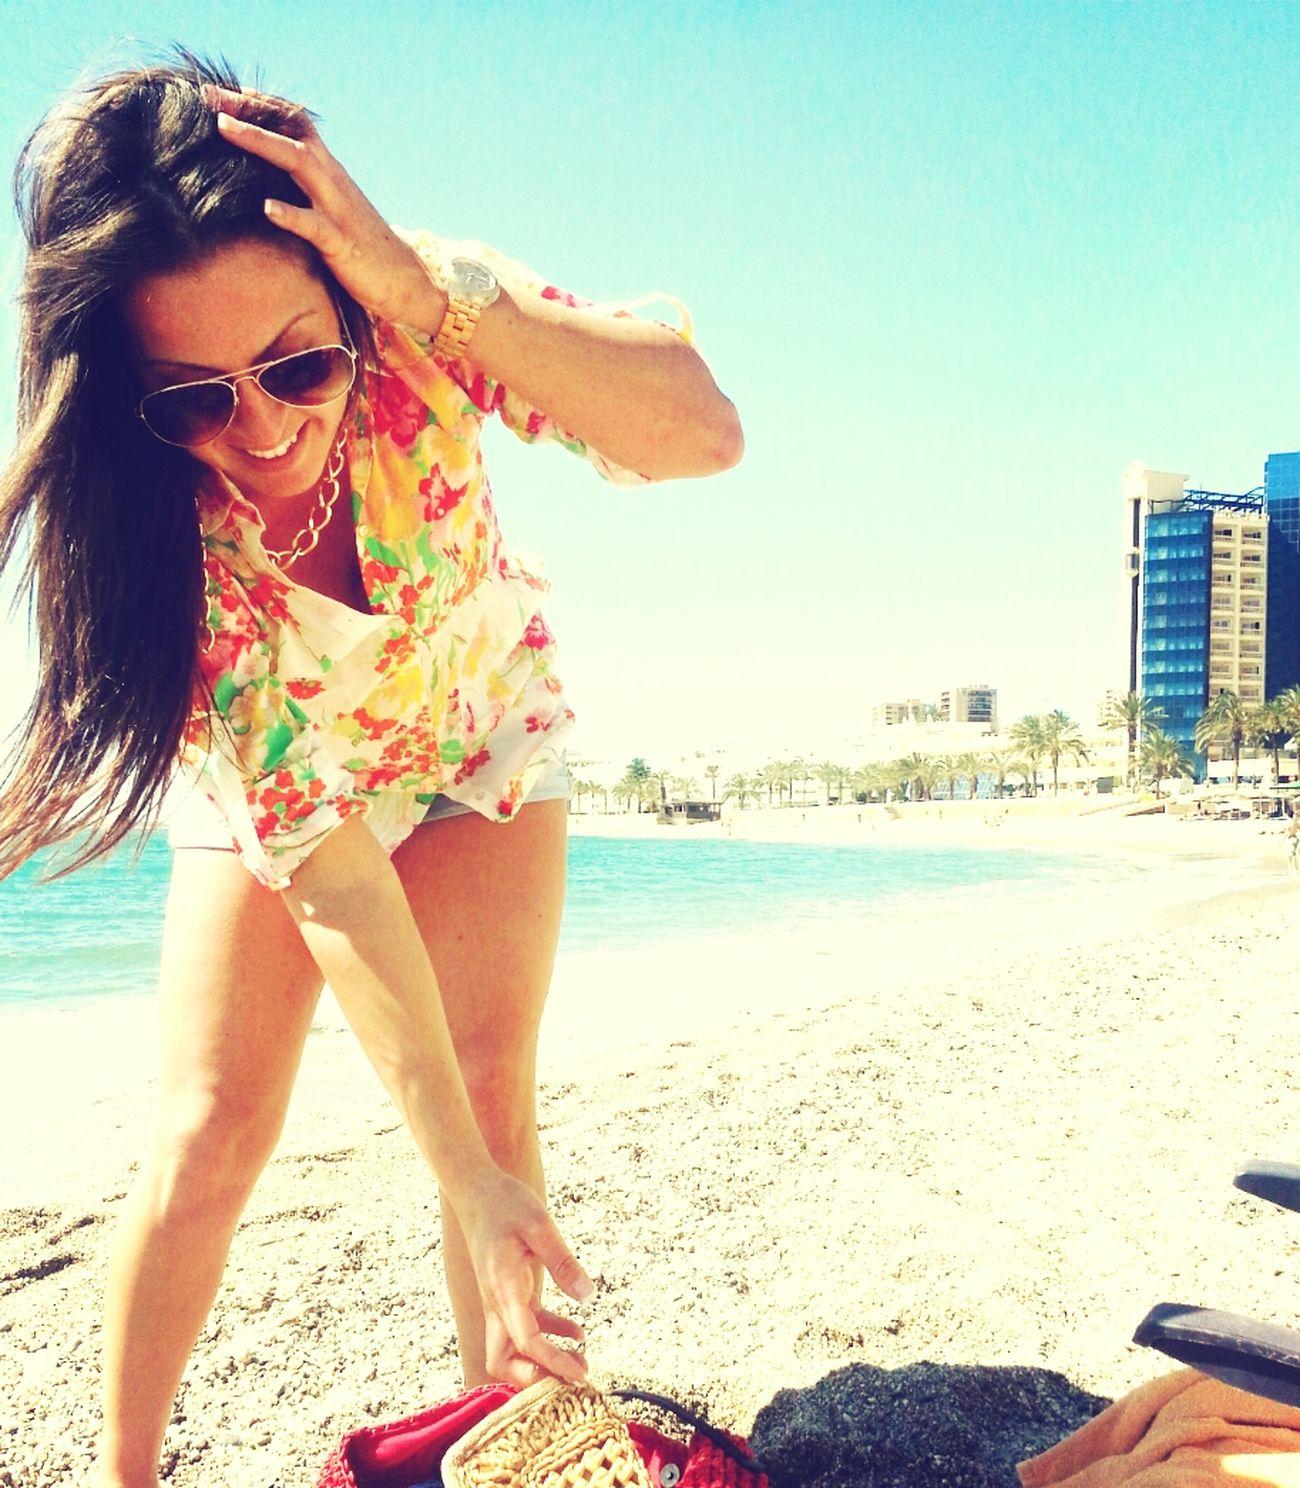 Tendencias That's Me Photo Beach